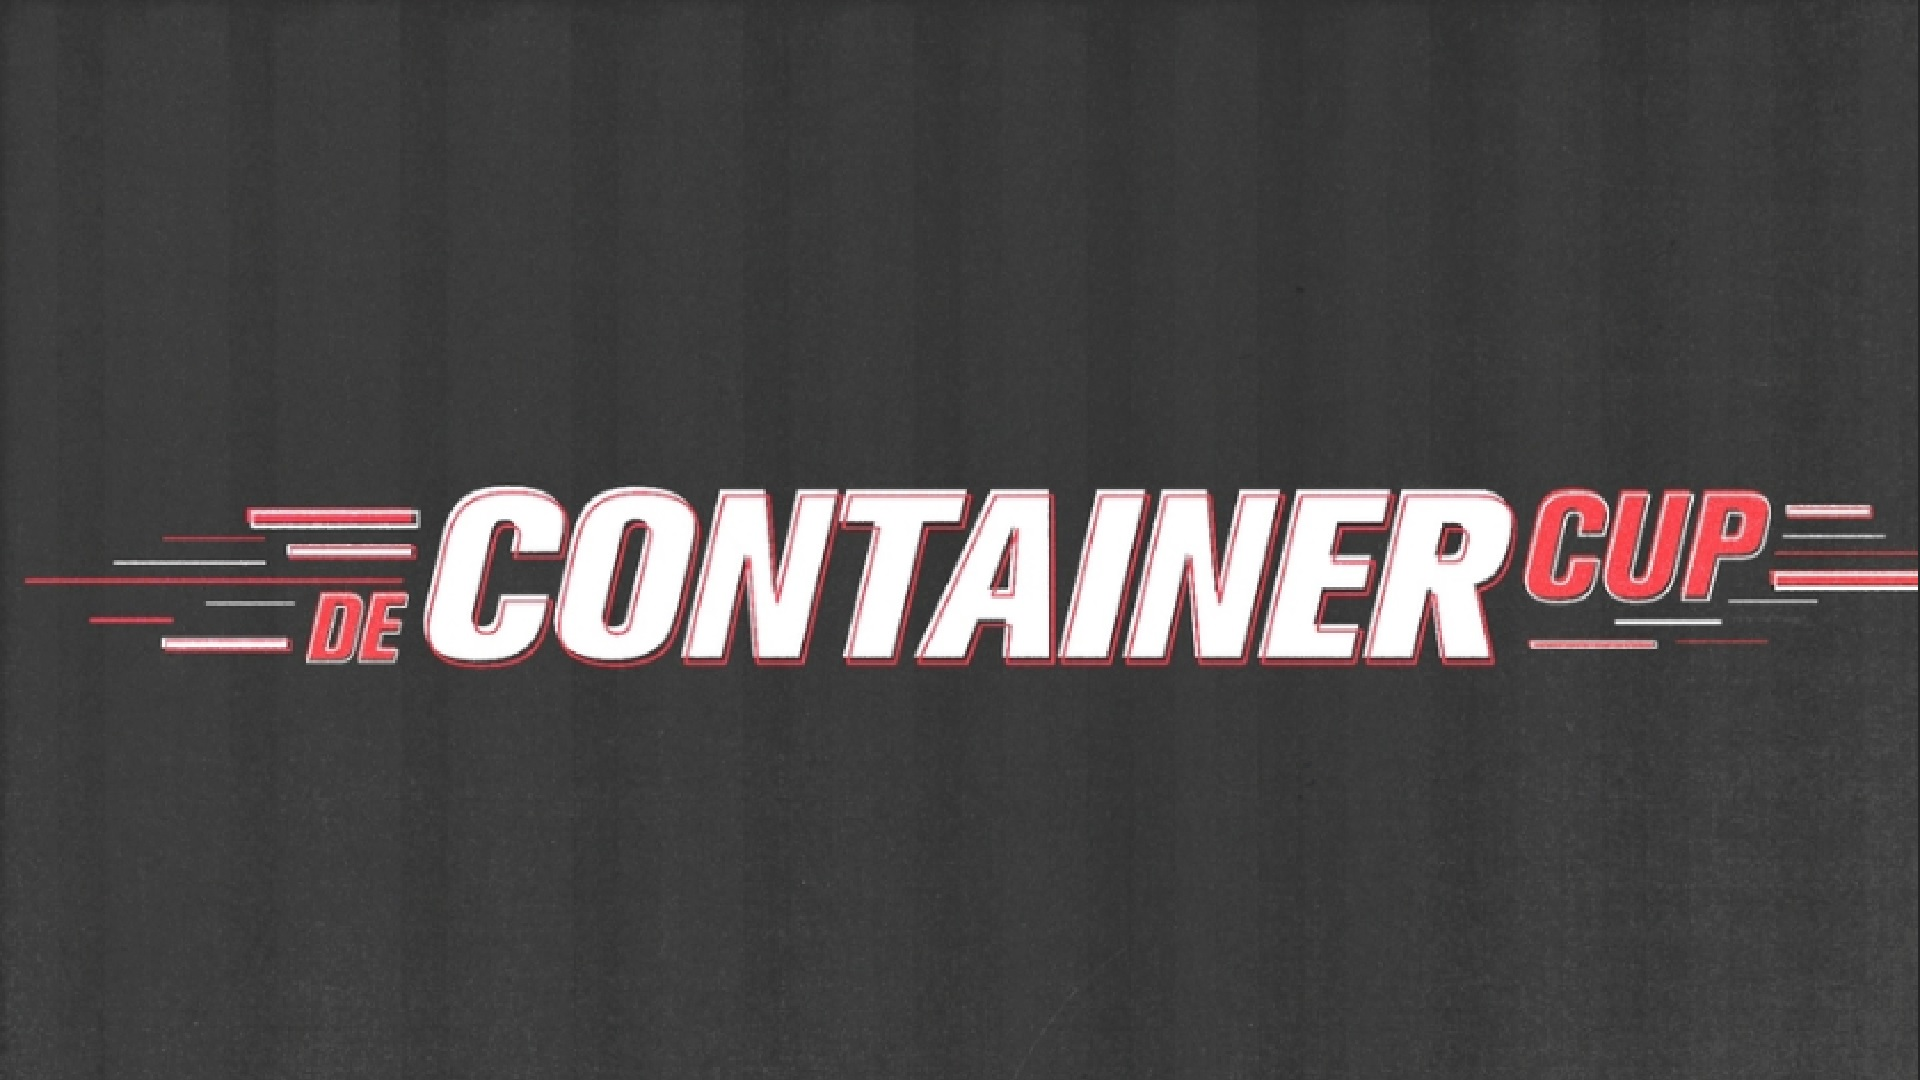 De Container Cup